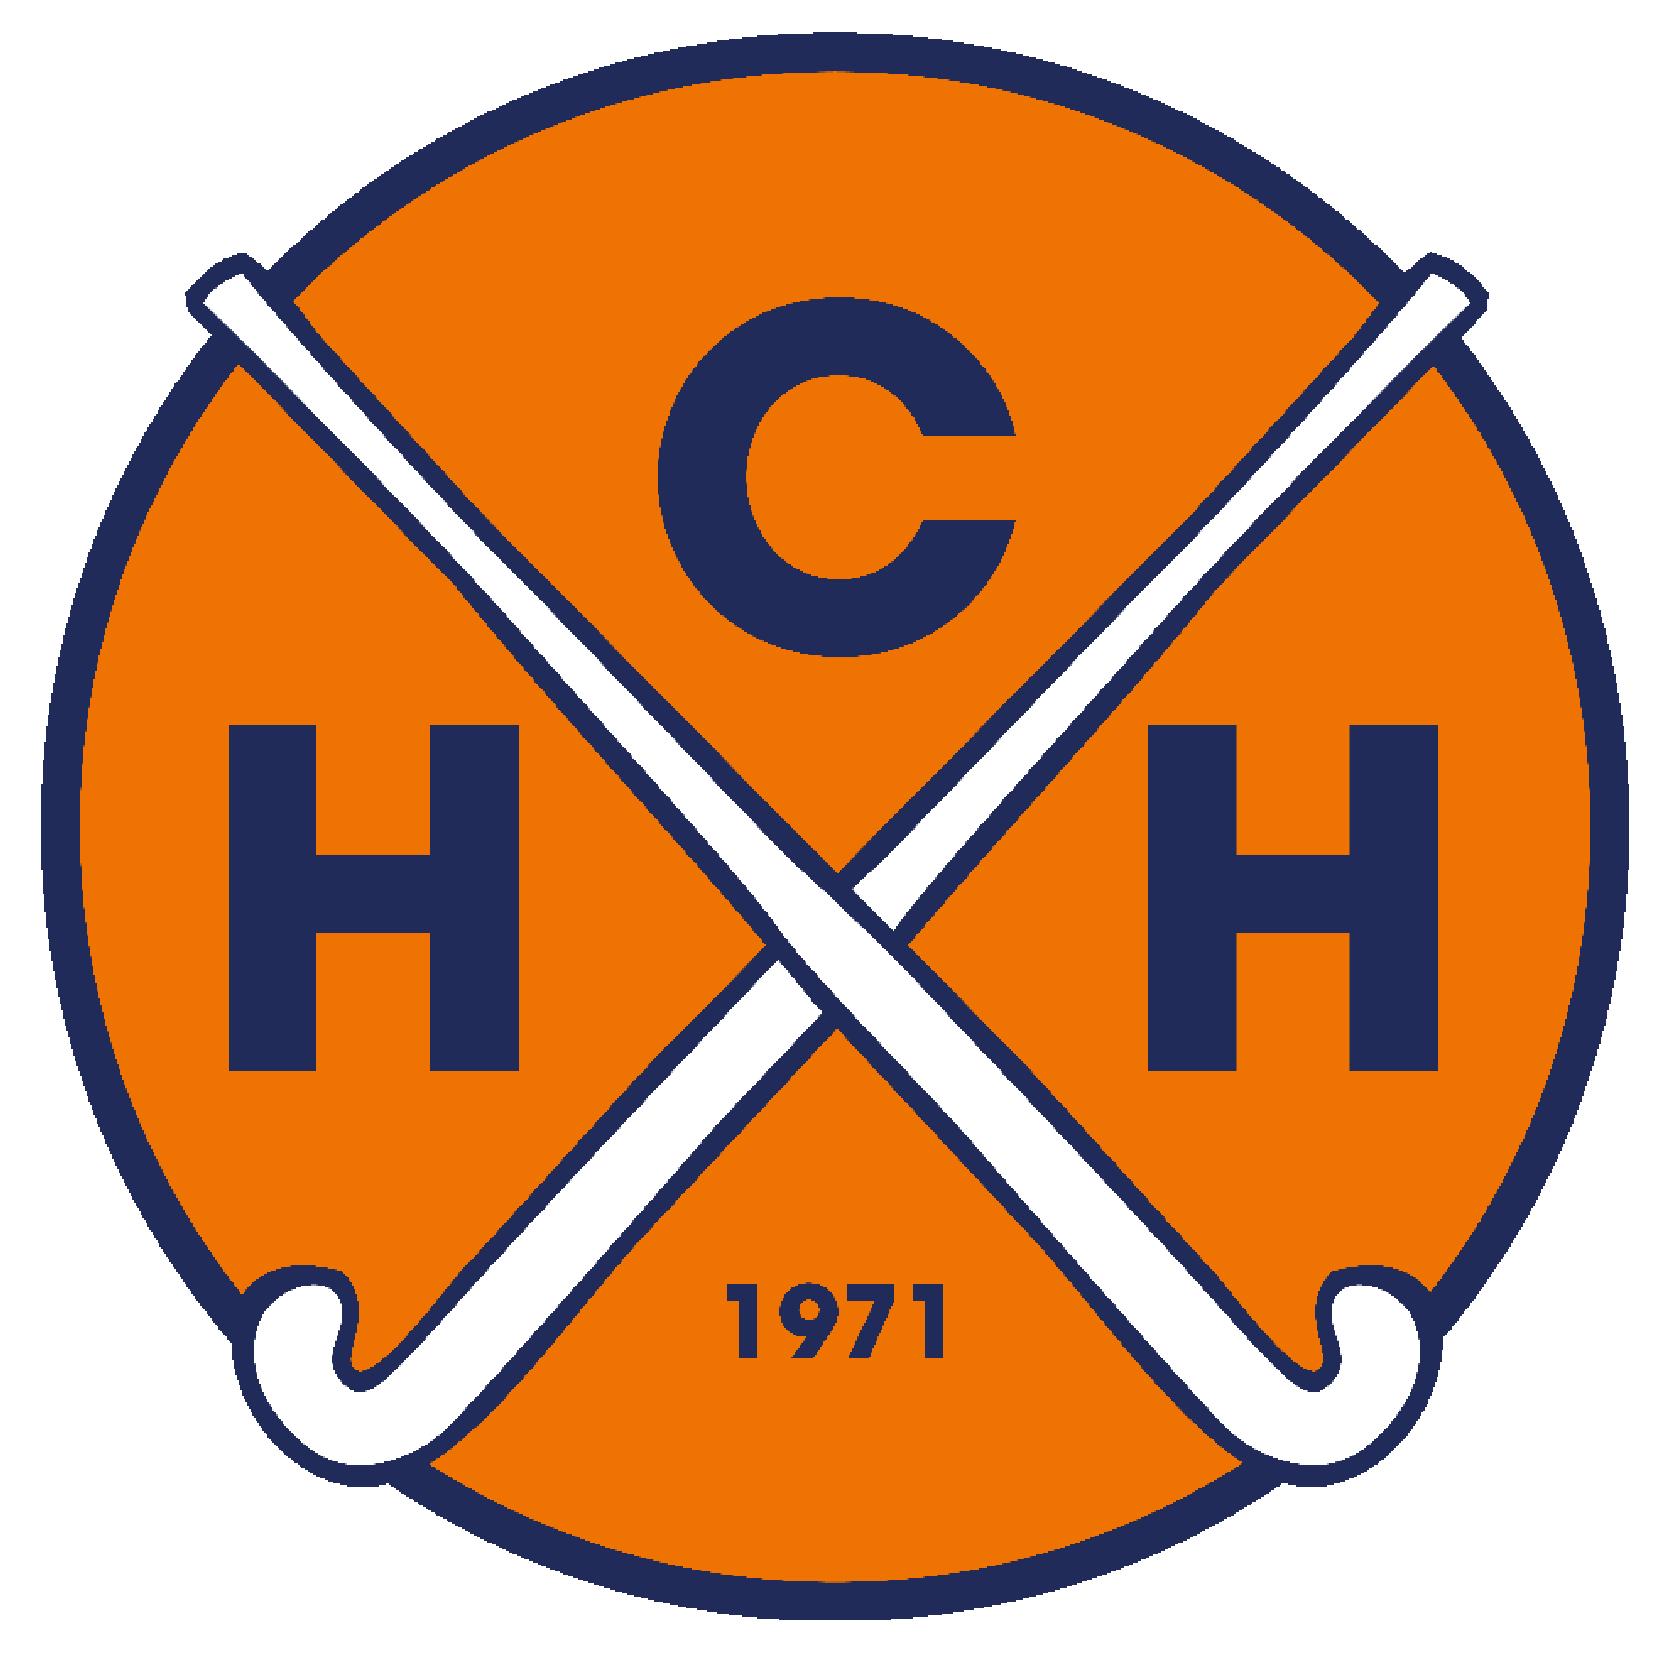 Haaskamp logo